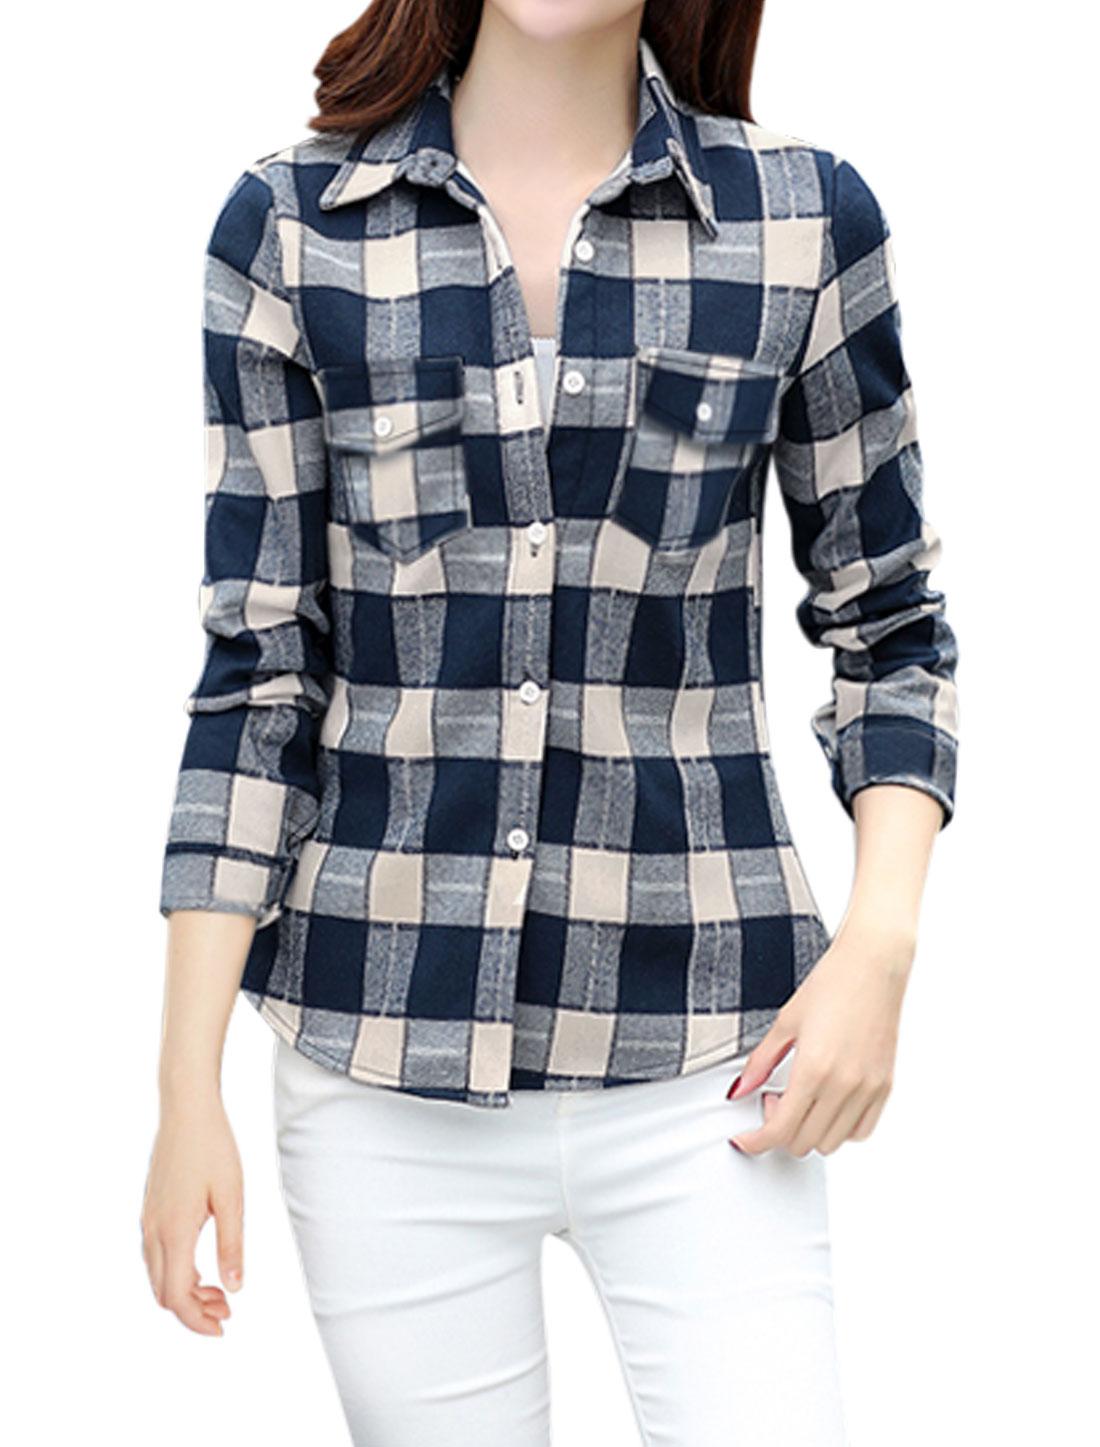 Women Long Sleeves Chest Pocket Button Down Checks Shirt Blue S